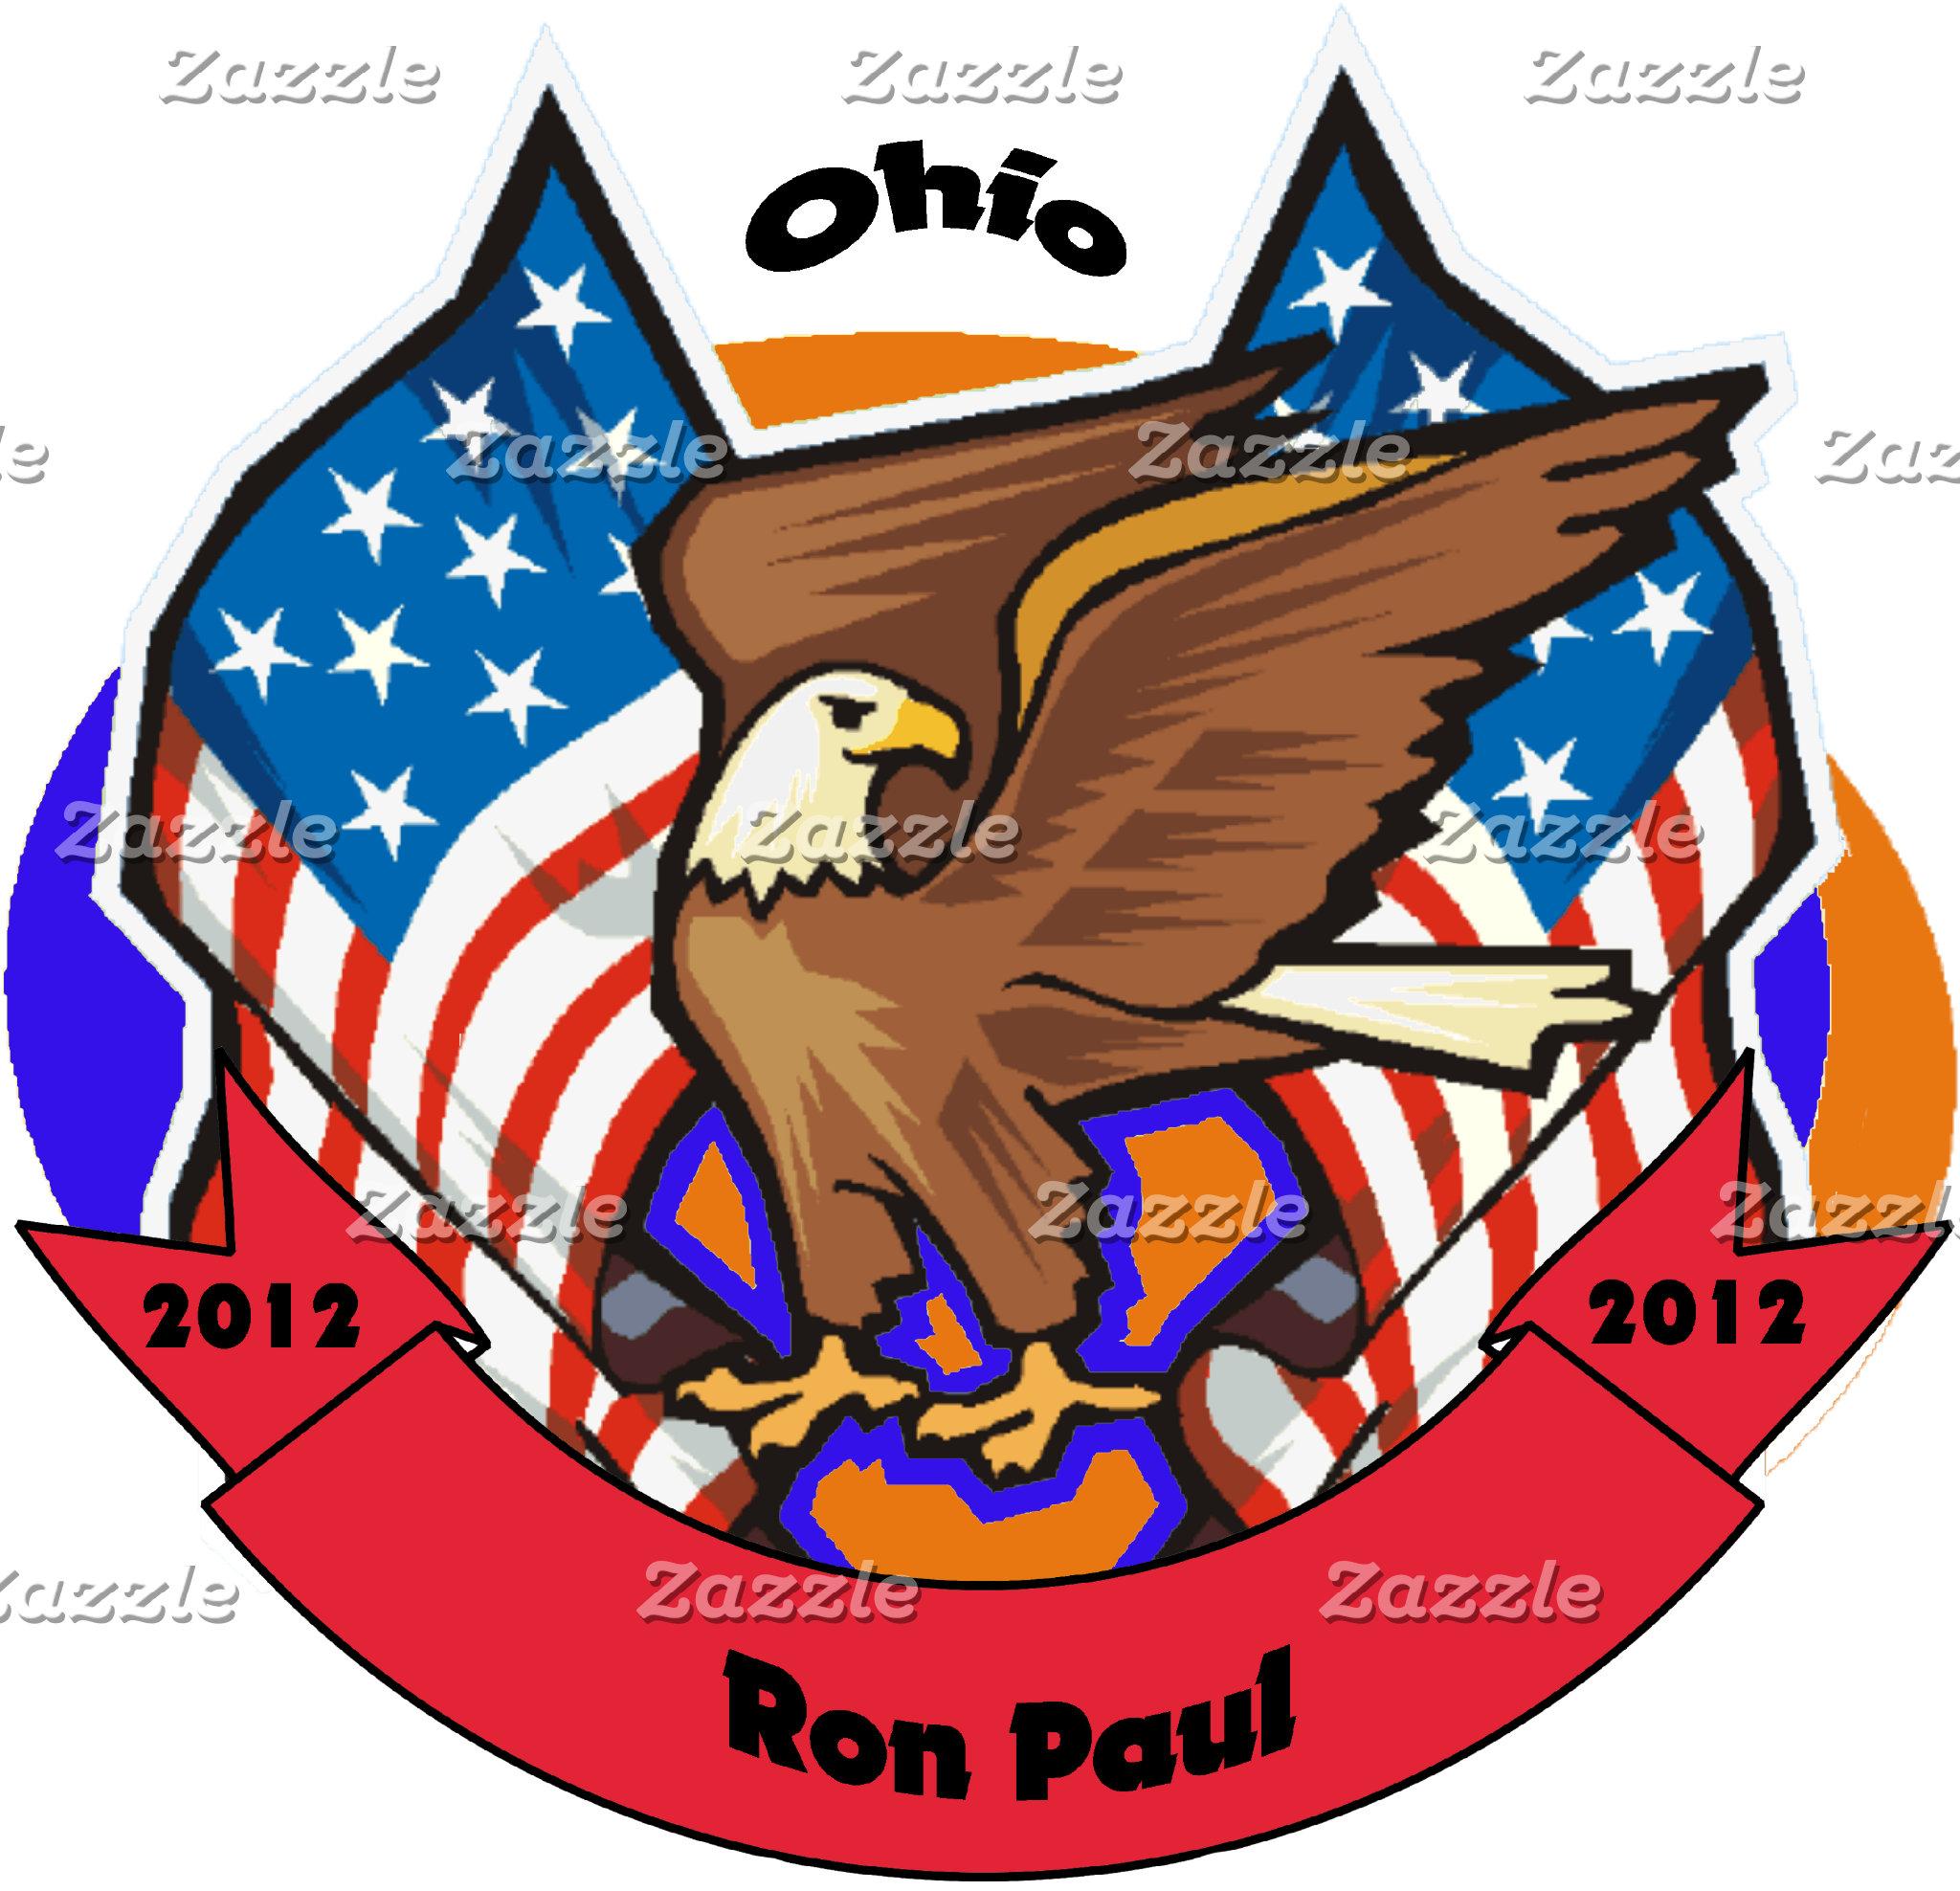 Ohio for Ron Paul